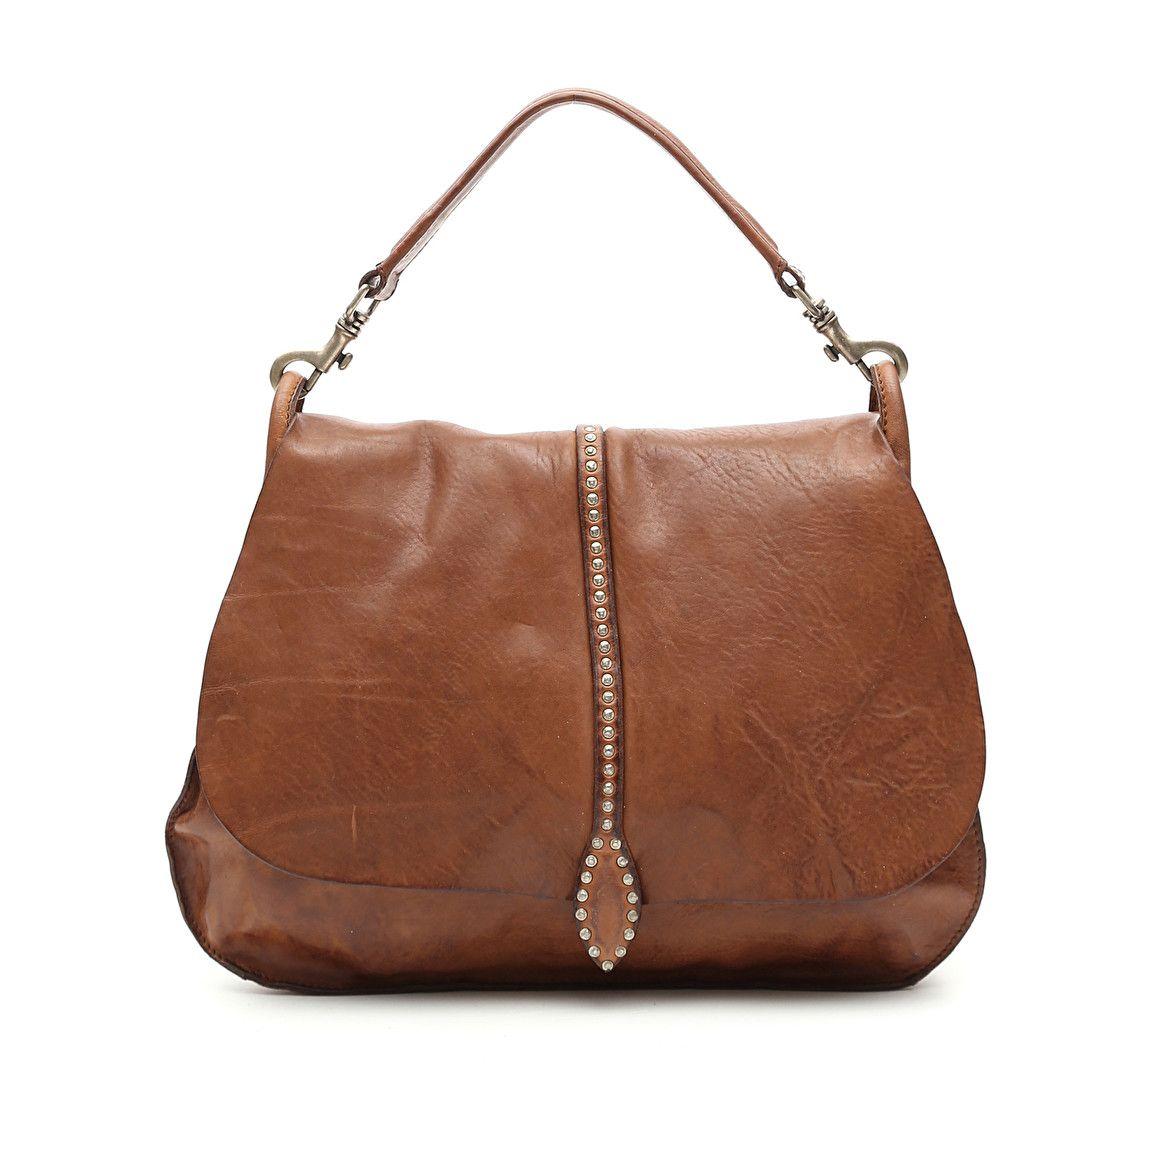 Baldric Bag In Cognac Leather With Artemisia Decoration Bags